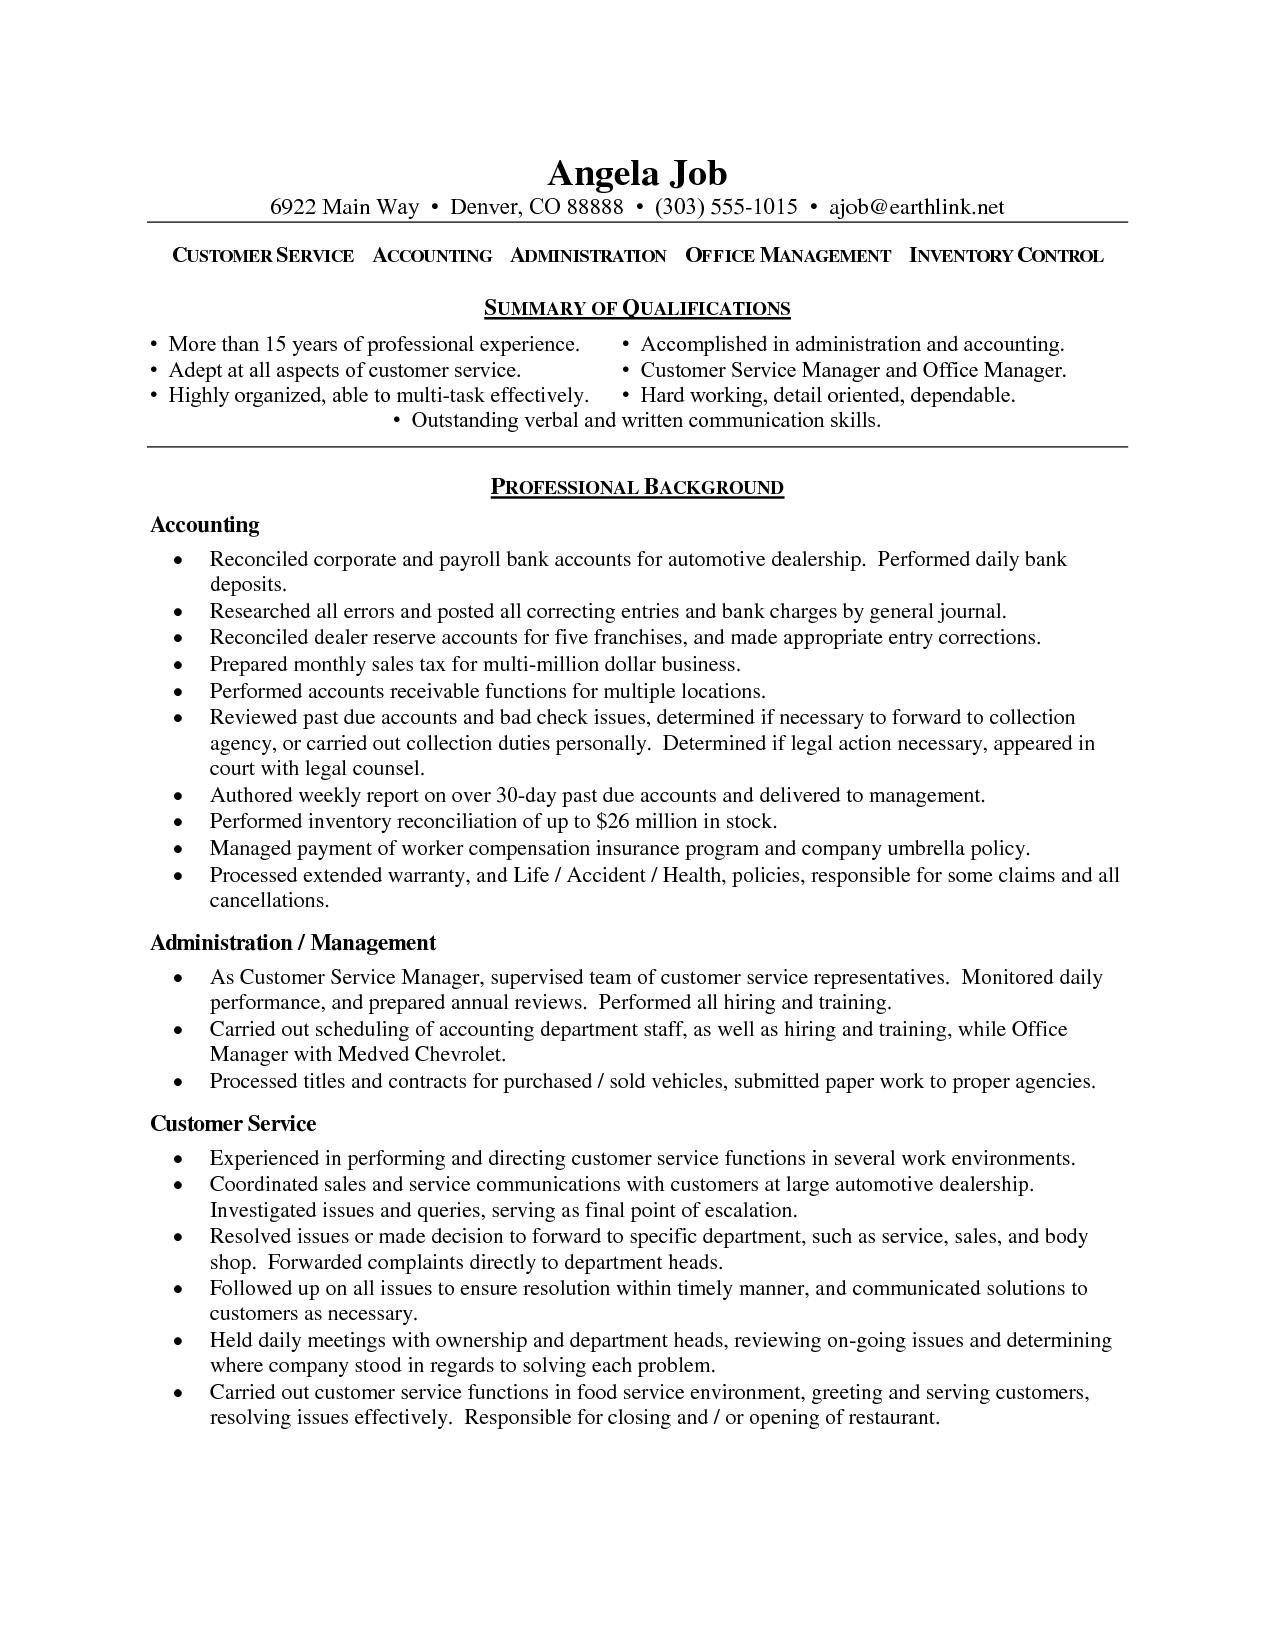 Customer Service Sample Resume Objective